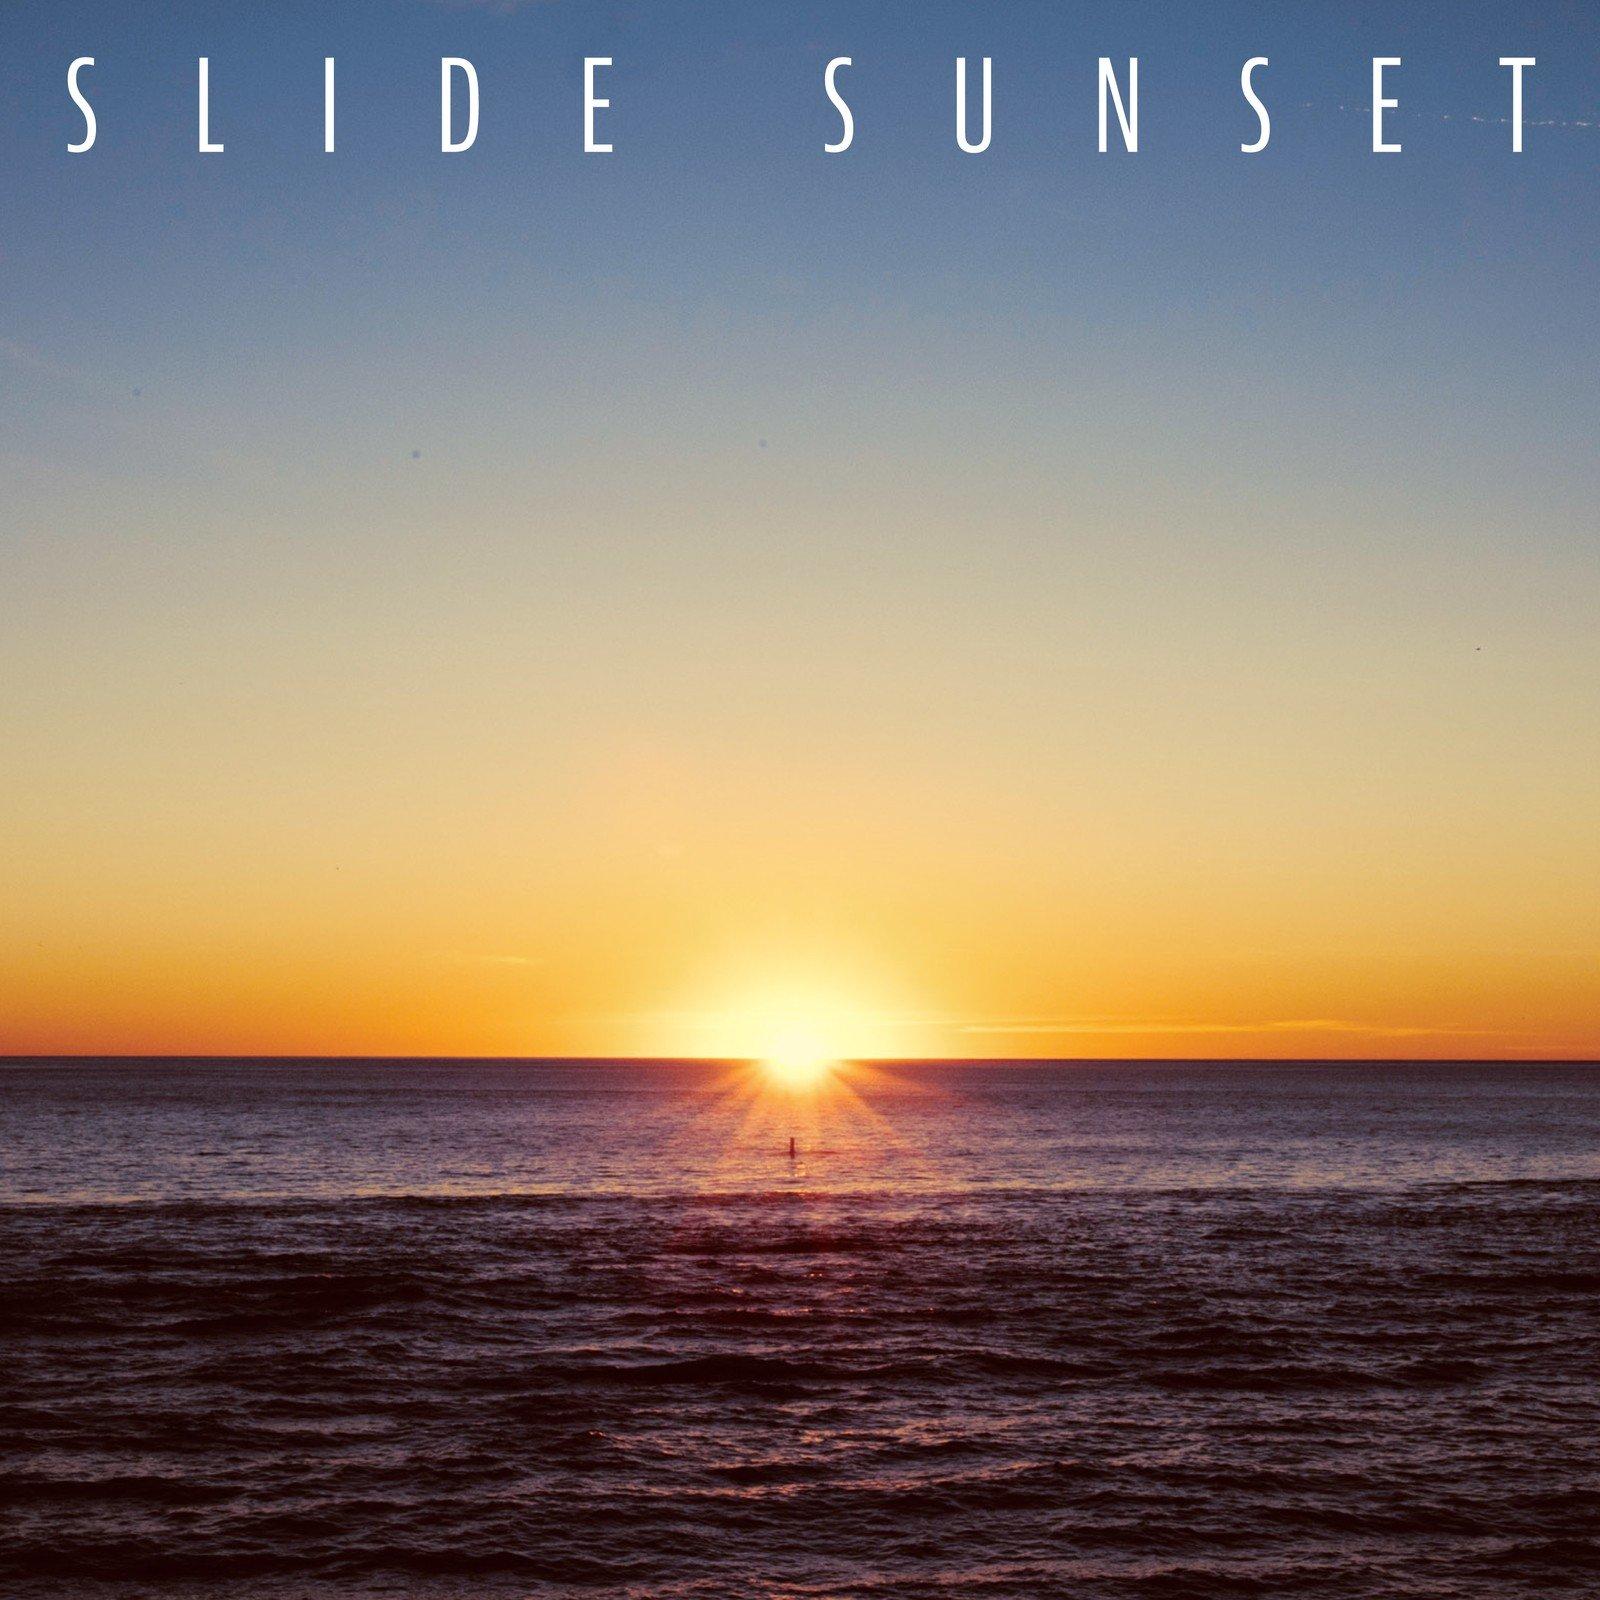 AliA – SLIDE SUNSET [24bit Lossless + MP3 320 / WEB] [2019.07.23]